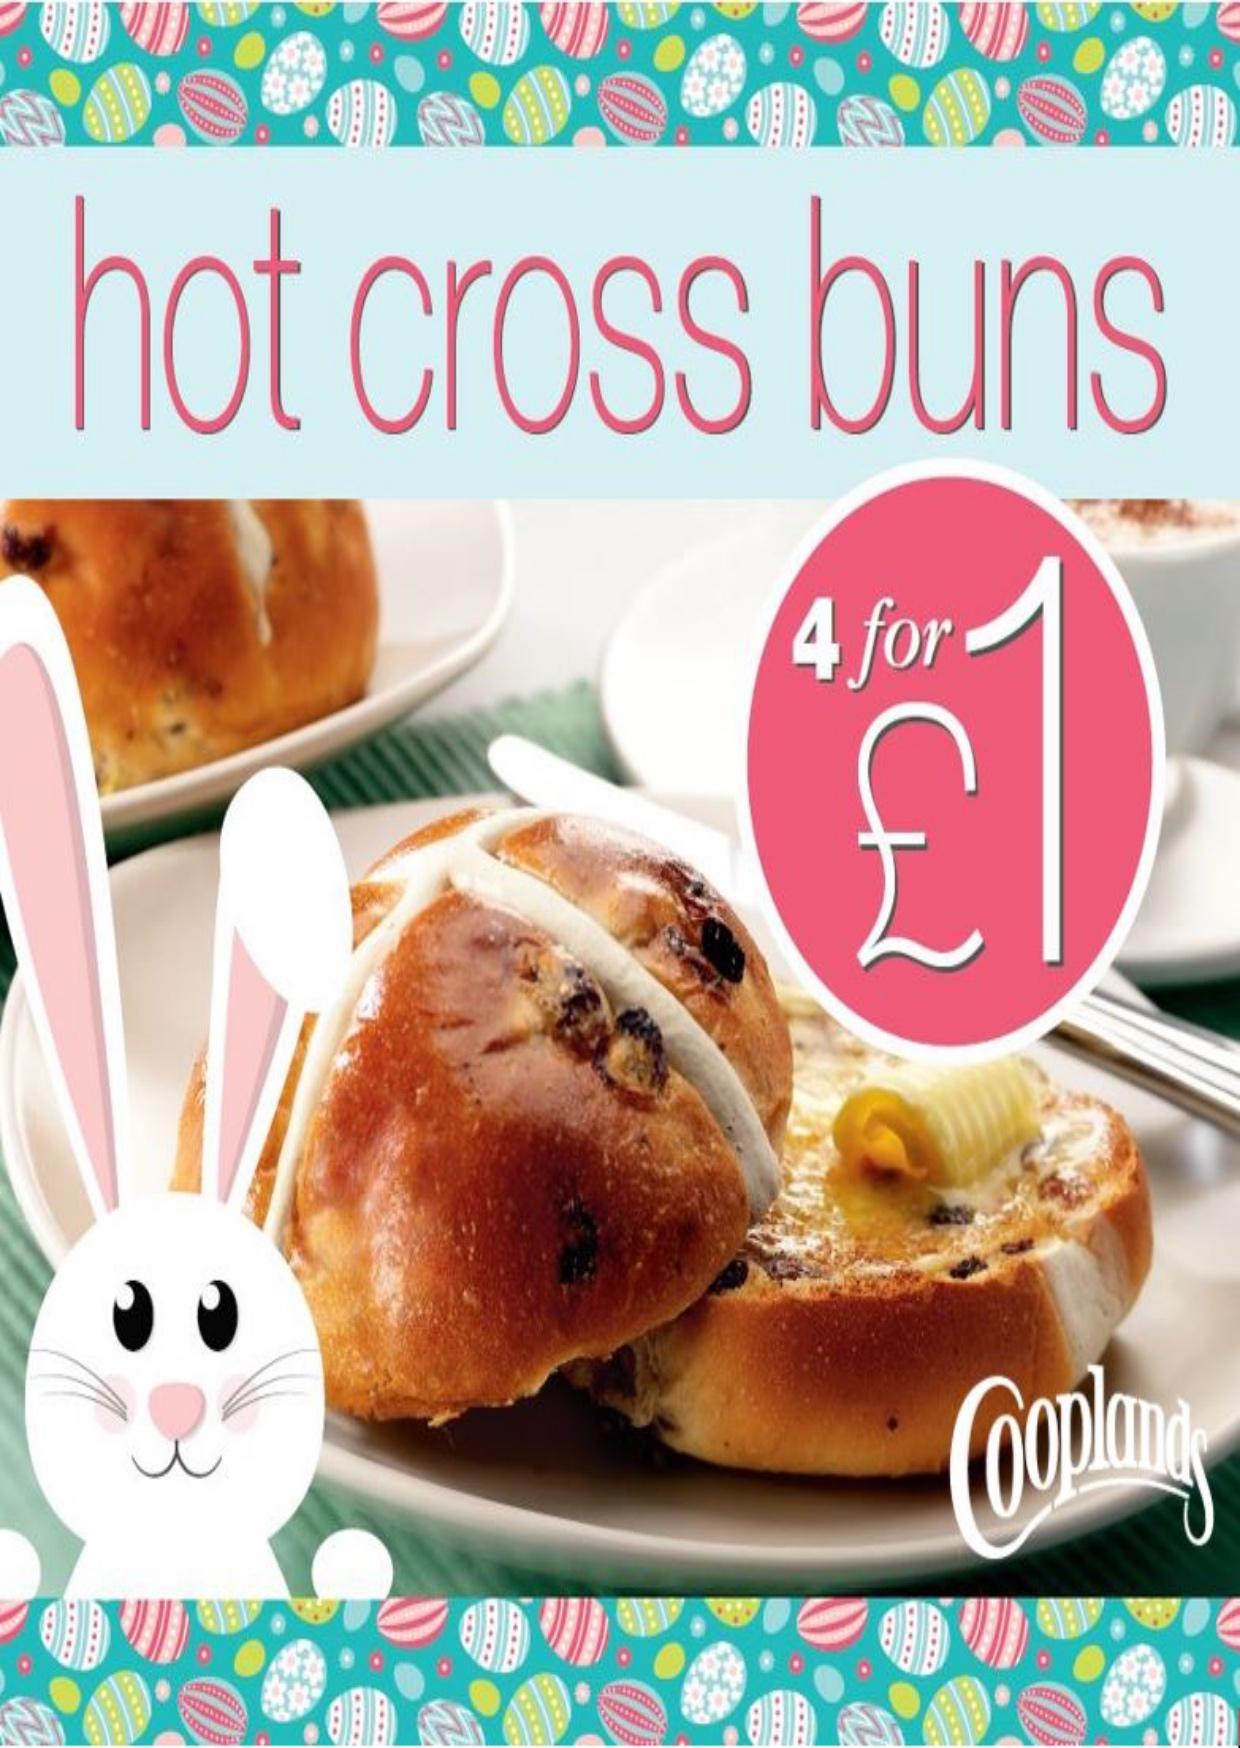 Hot cross buns 4 for £1